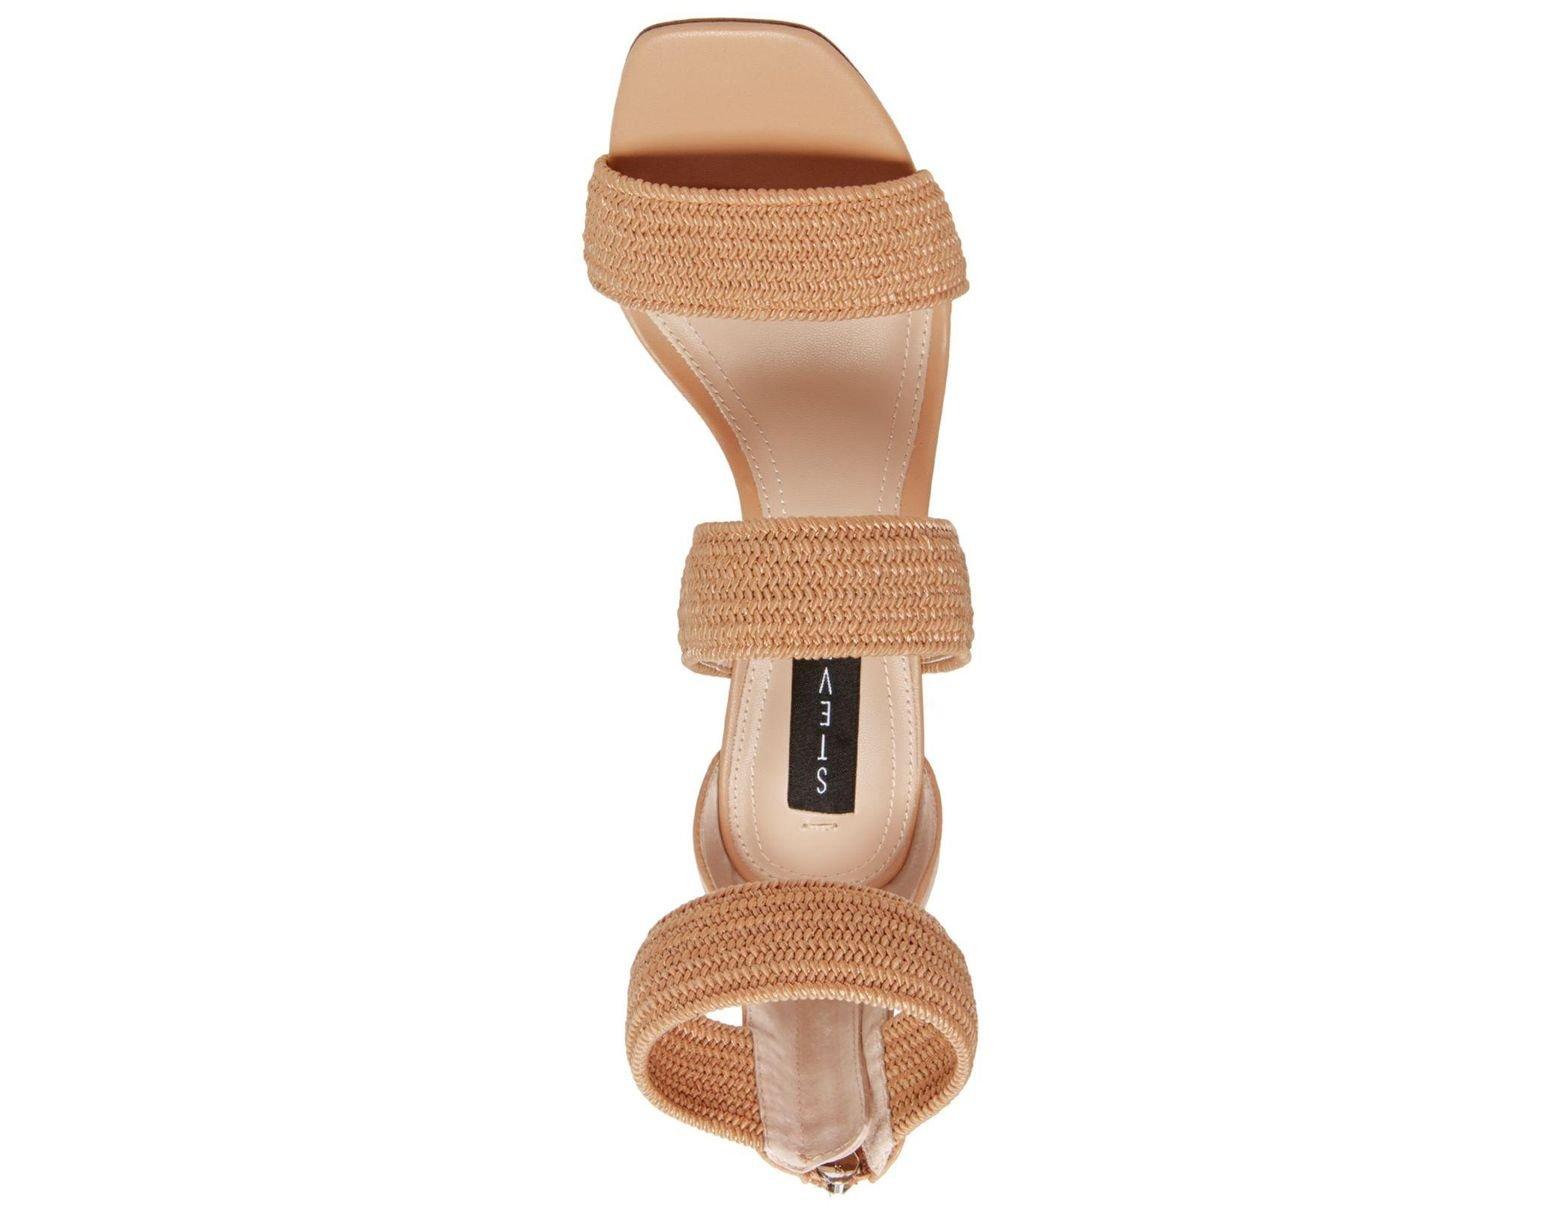 9851b929d821 Lyst - Steven by Steve Madden Jelly Stretch Dress Sandals